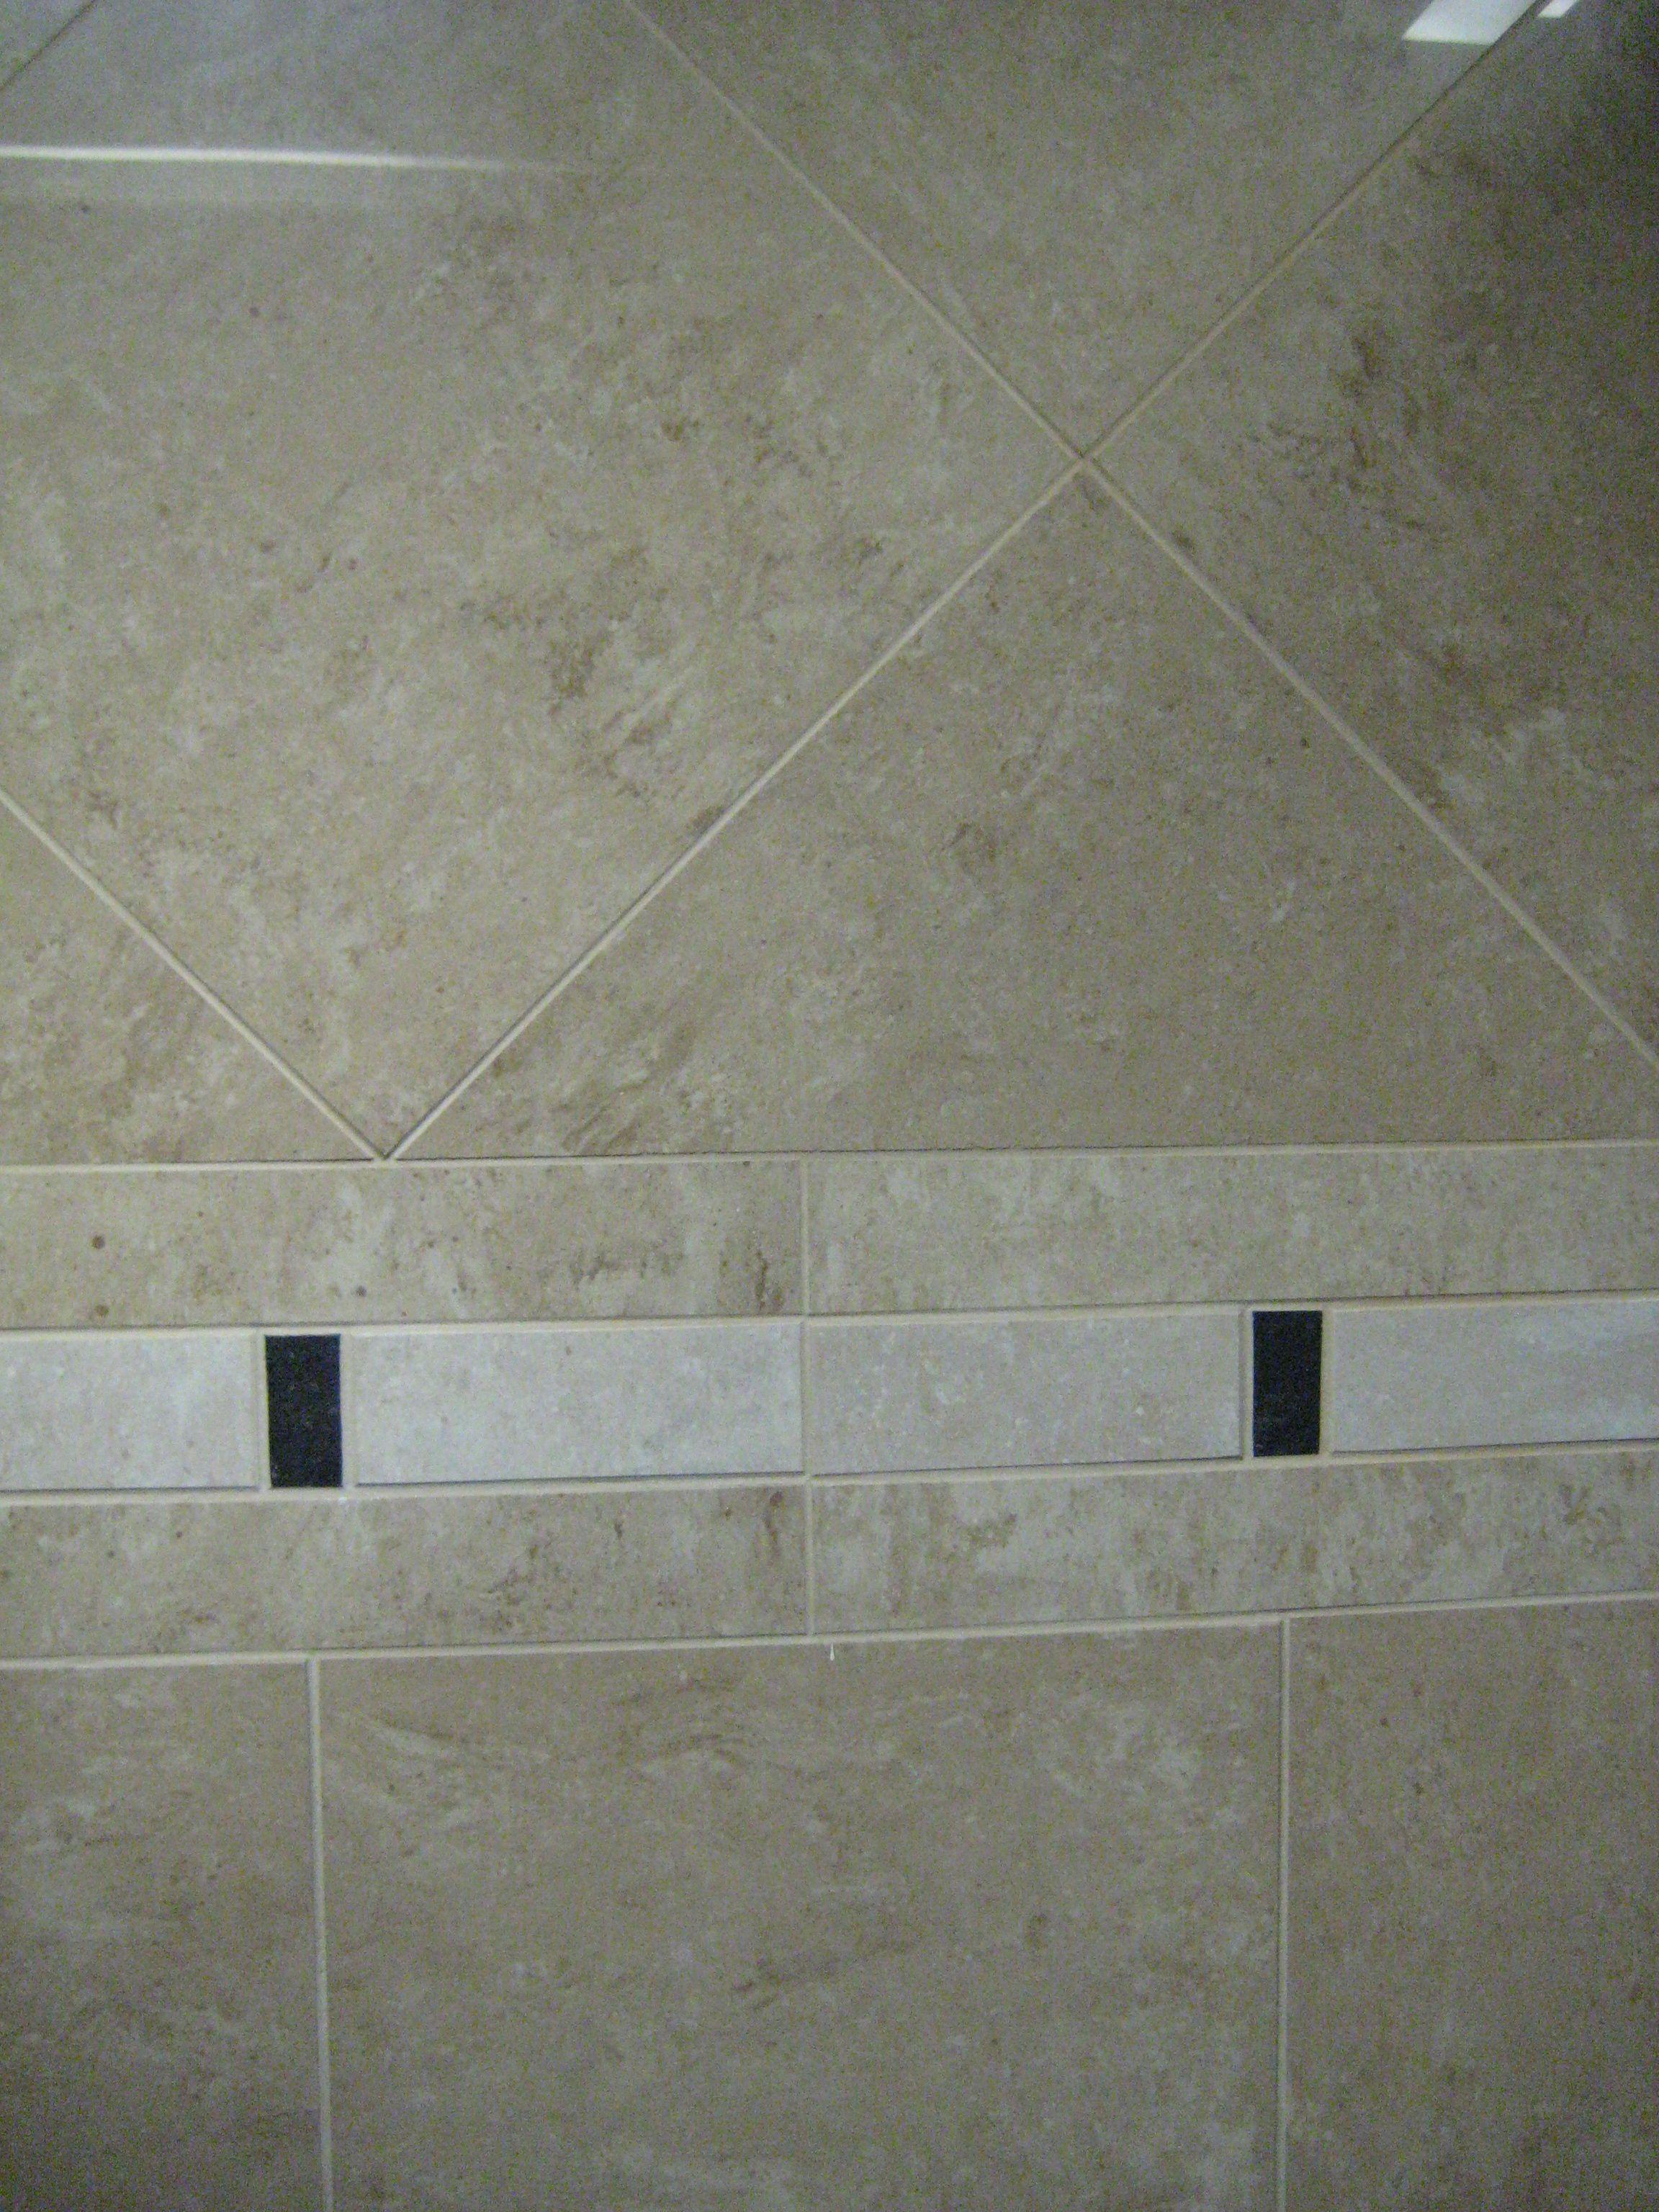 travertine shower tiles with simple border bathroom. Black Bedroom Furniture Sets. Home Design Ideas